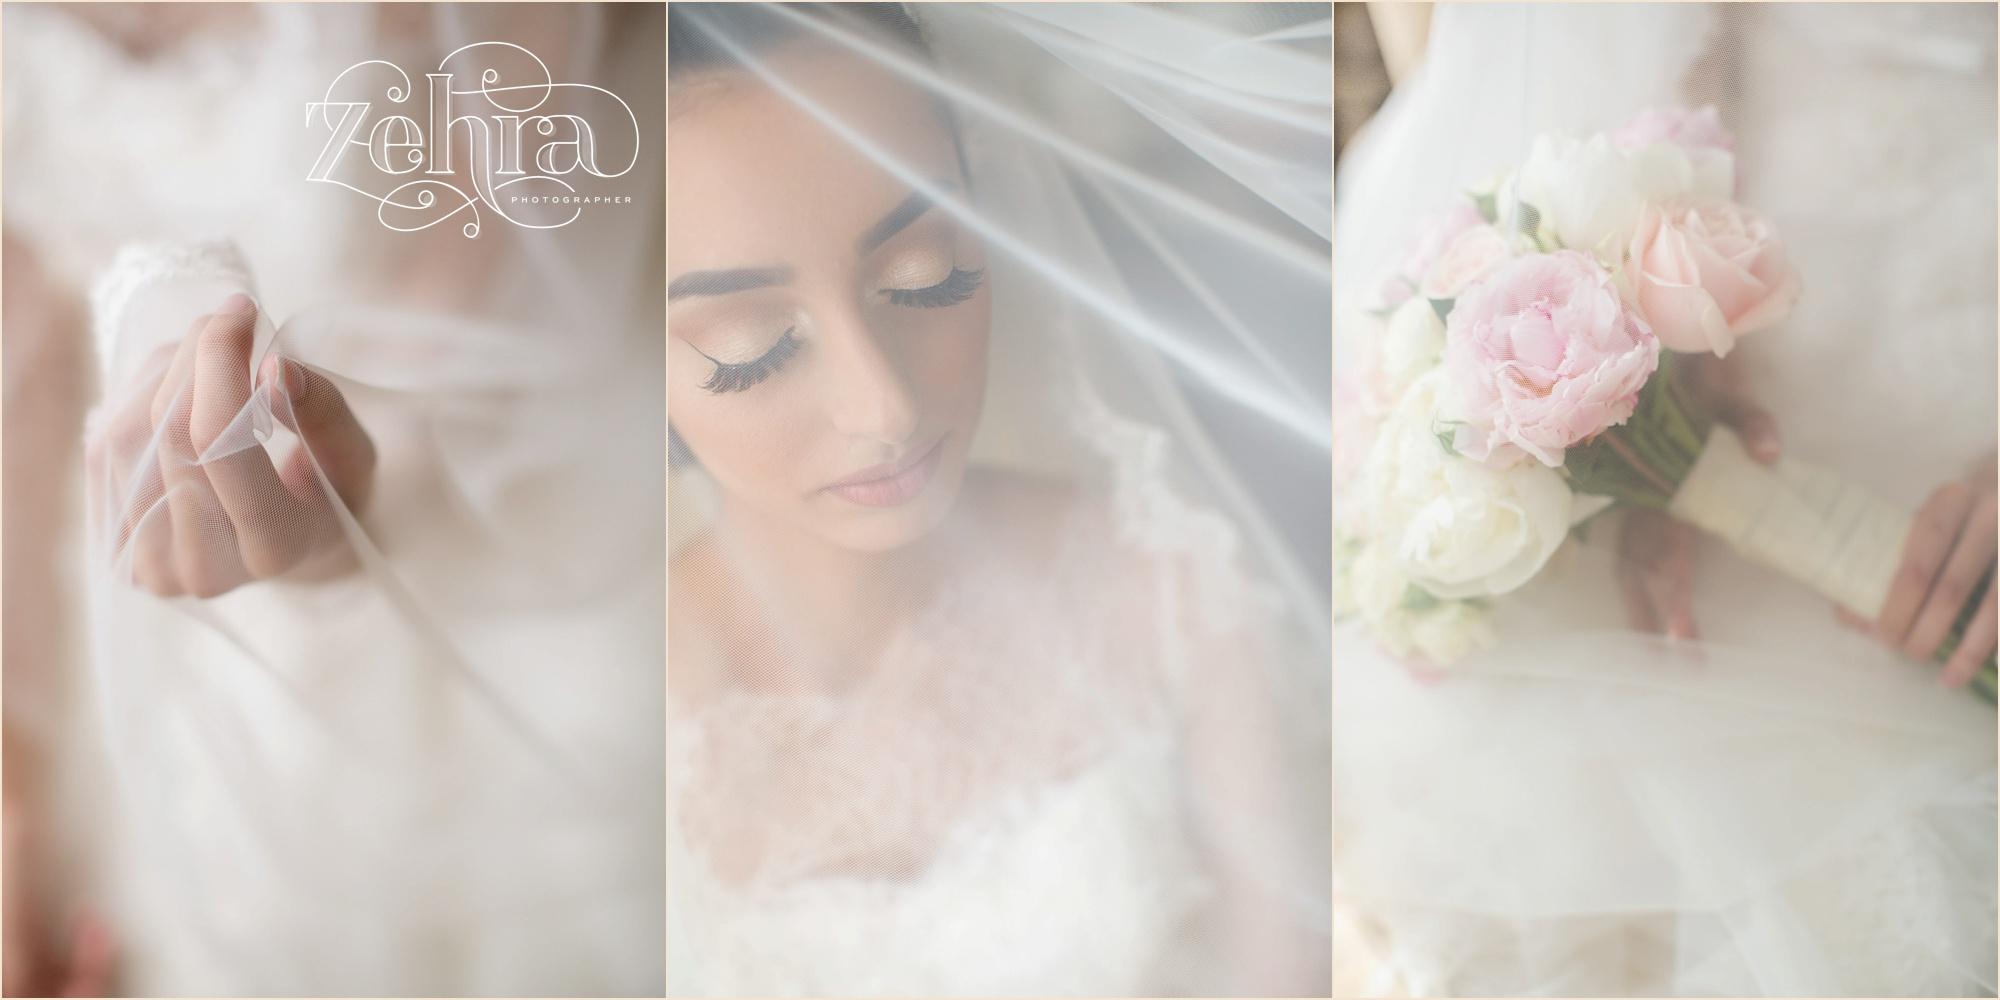 jasira manchester wedding photographer_0021.jpg